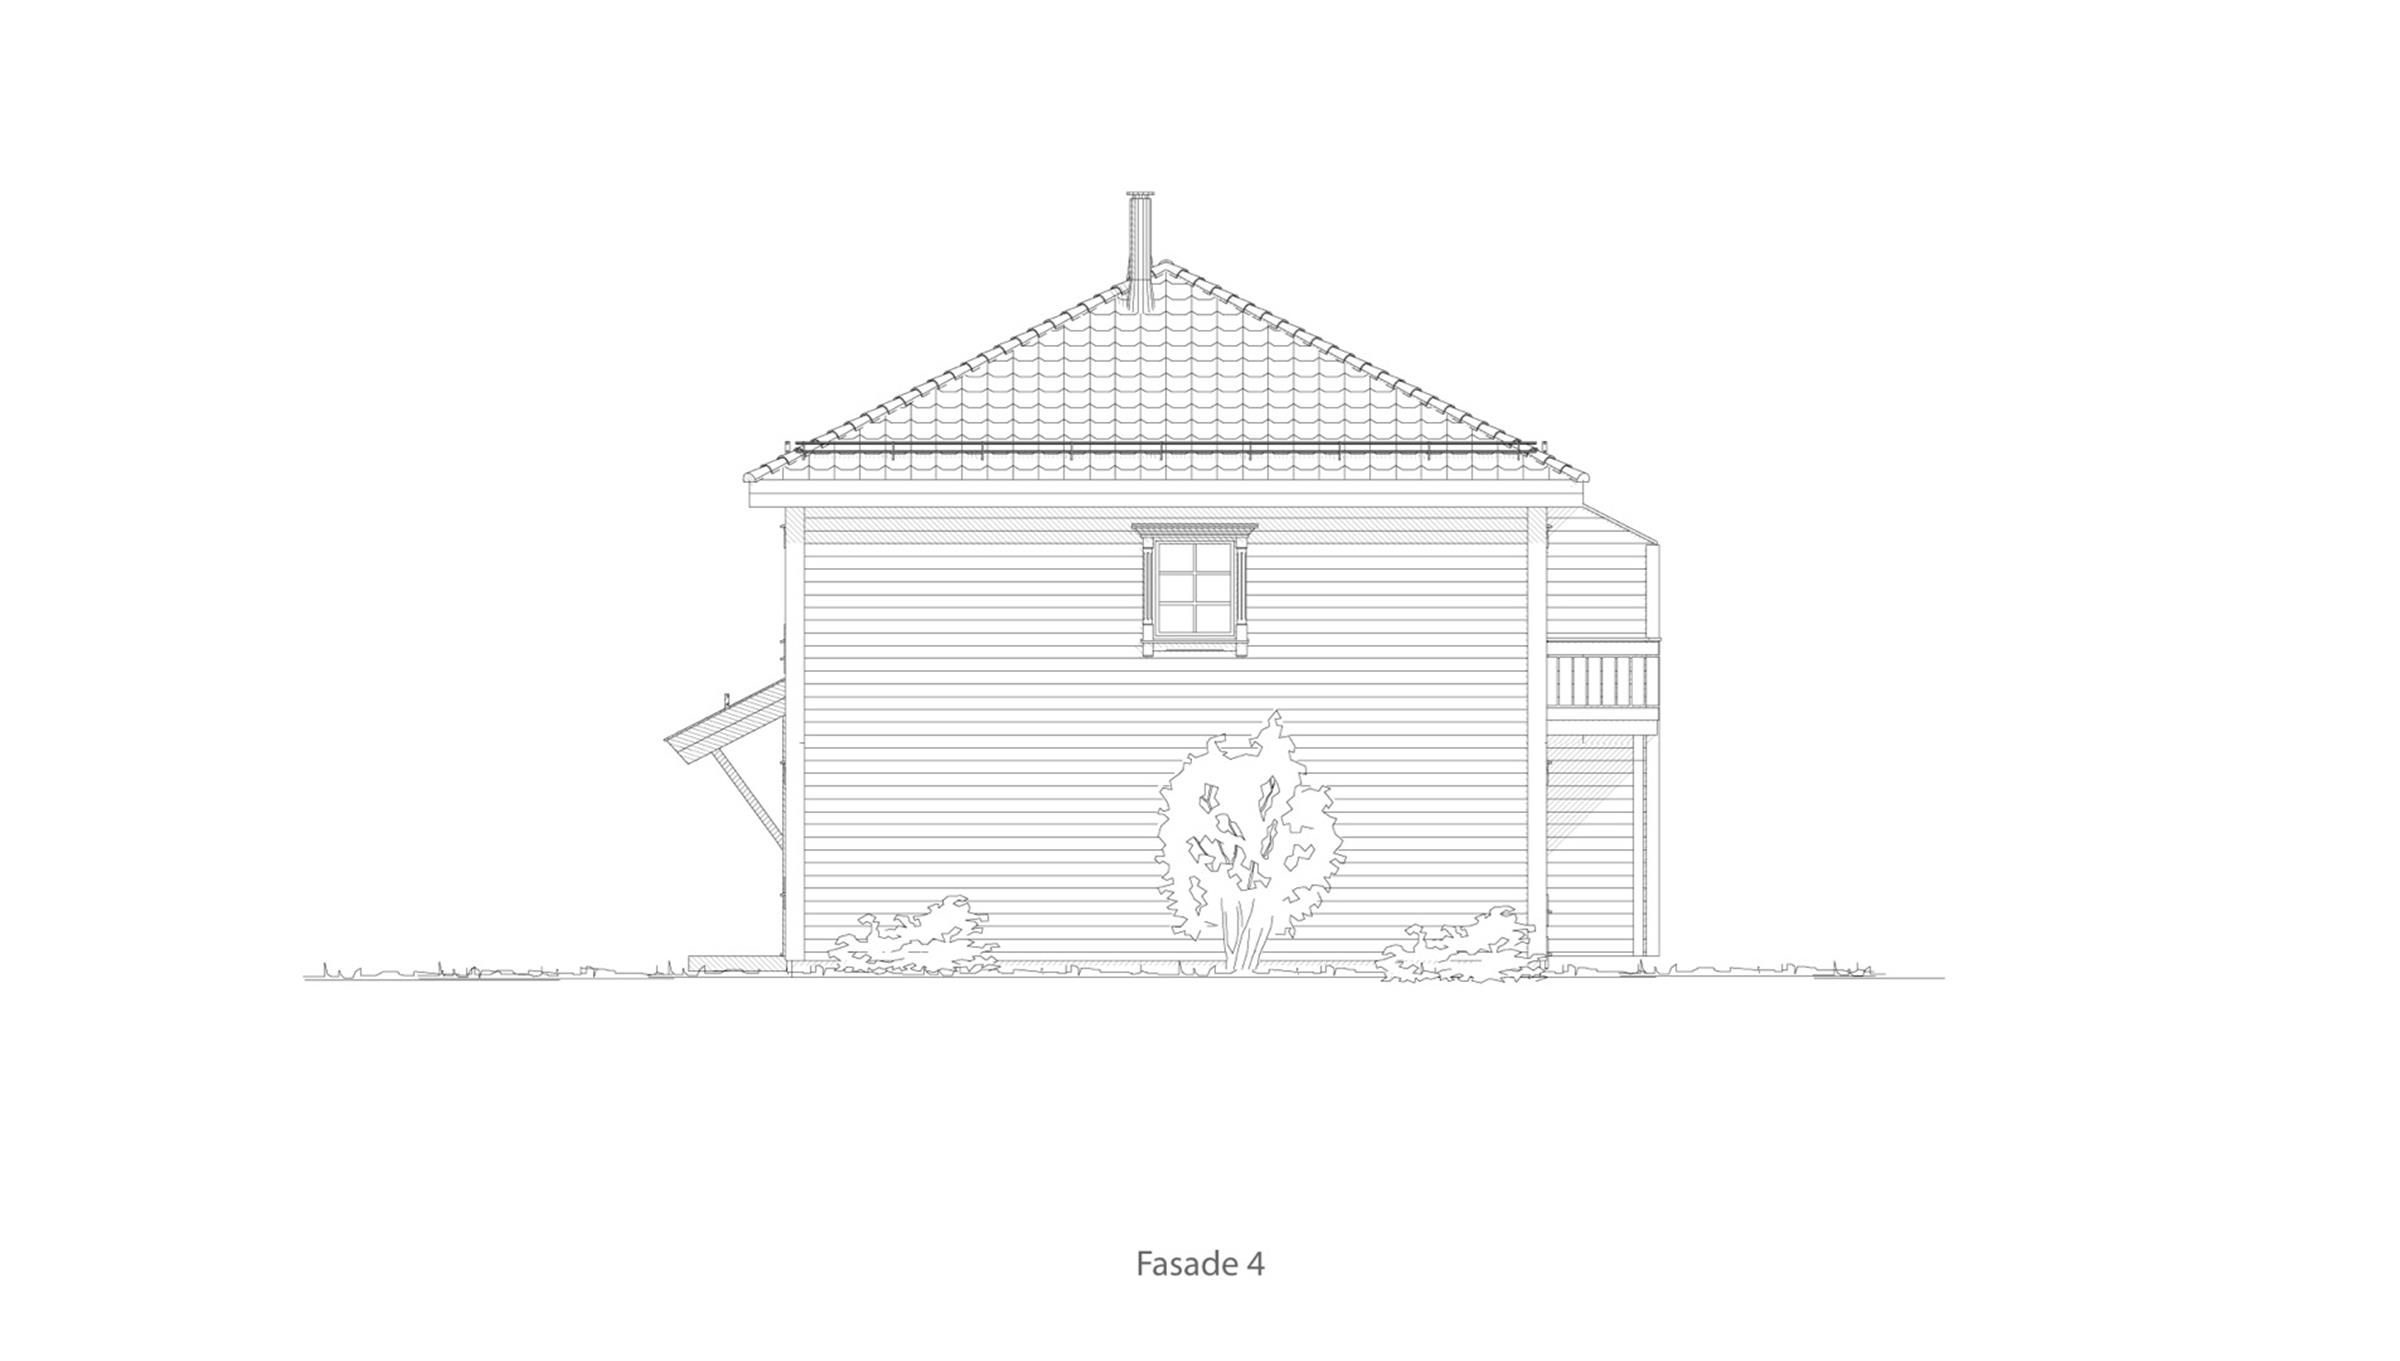 Gjøvik fasade 4